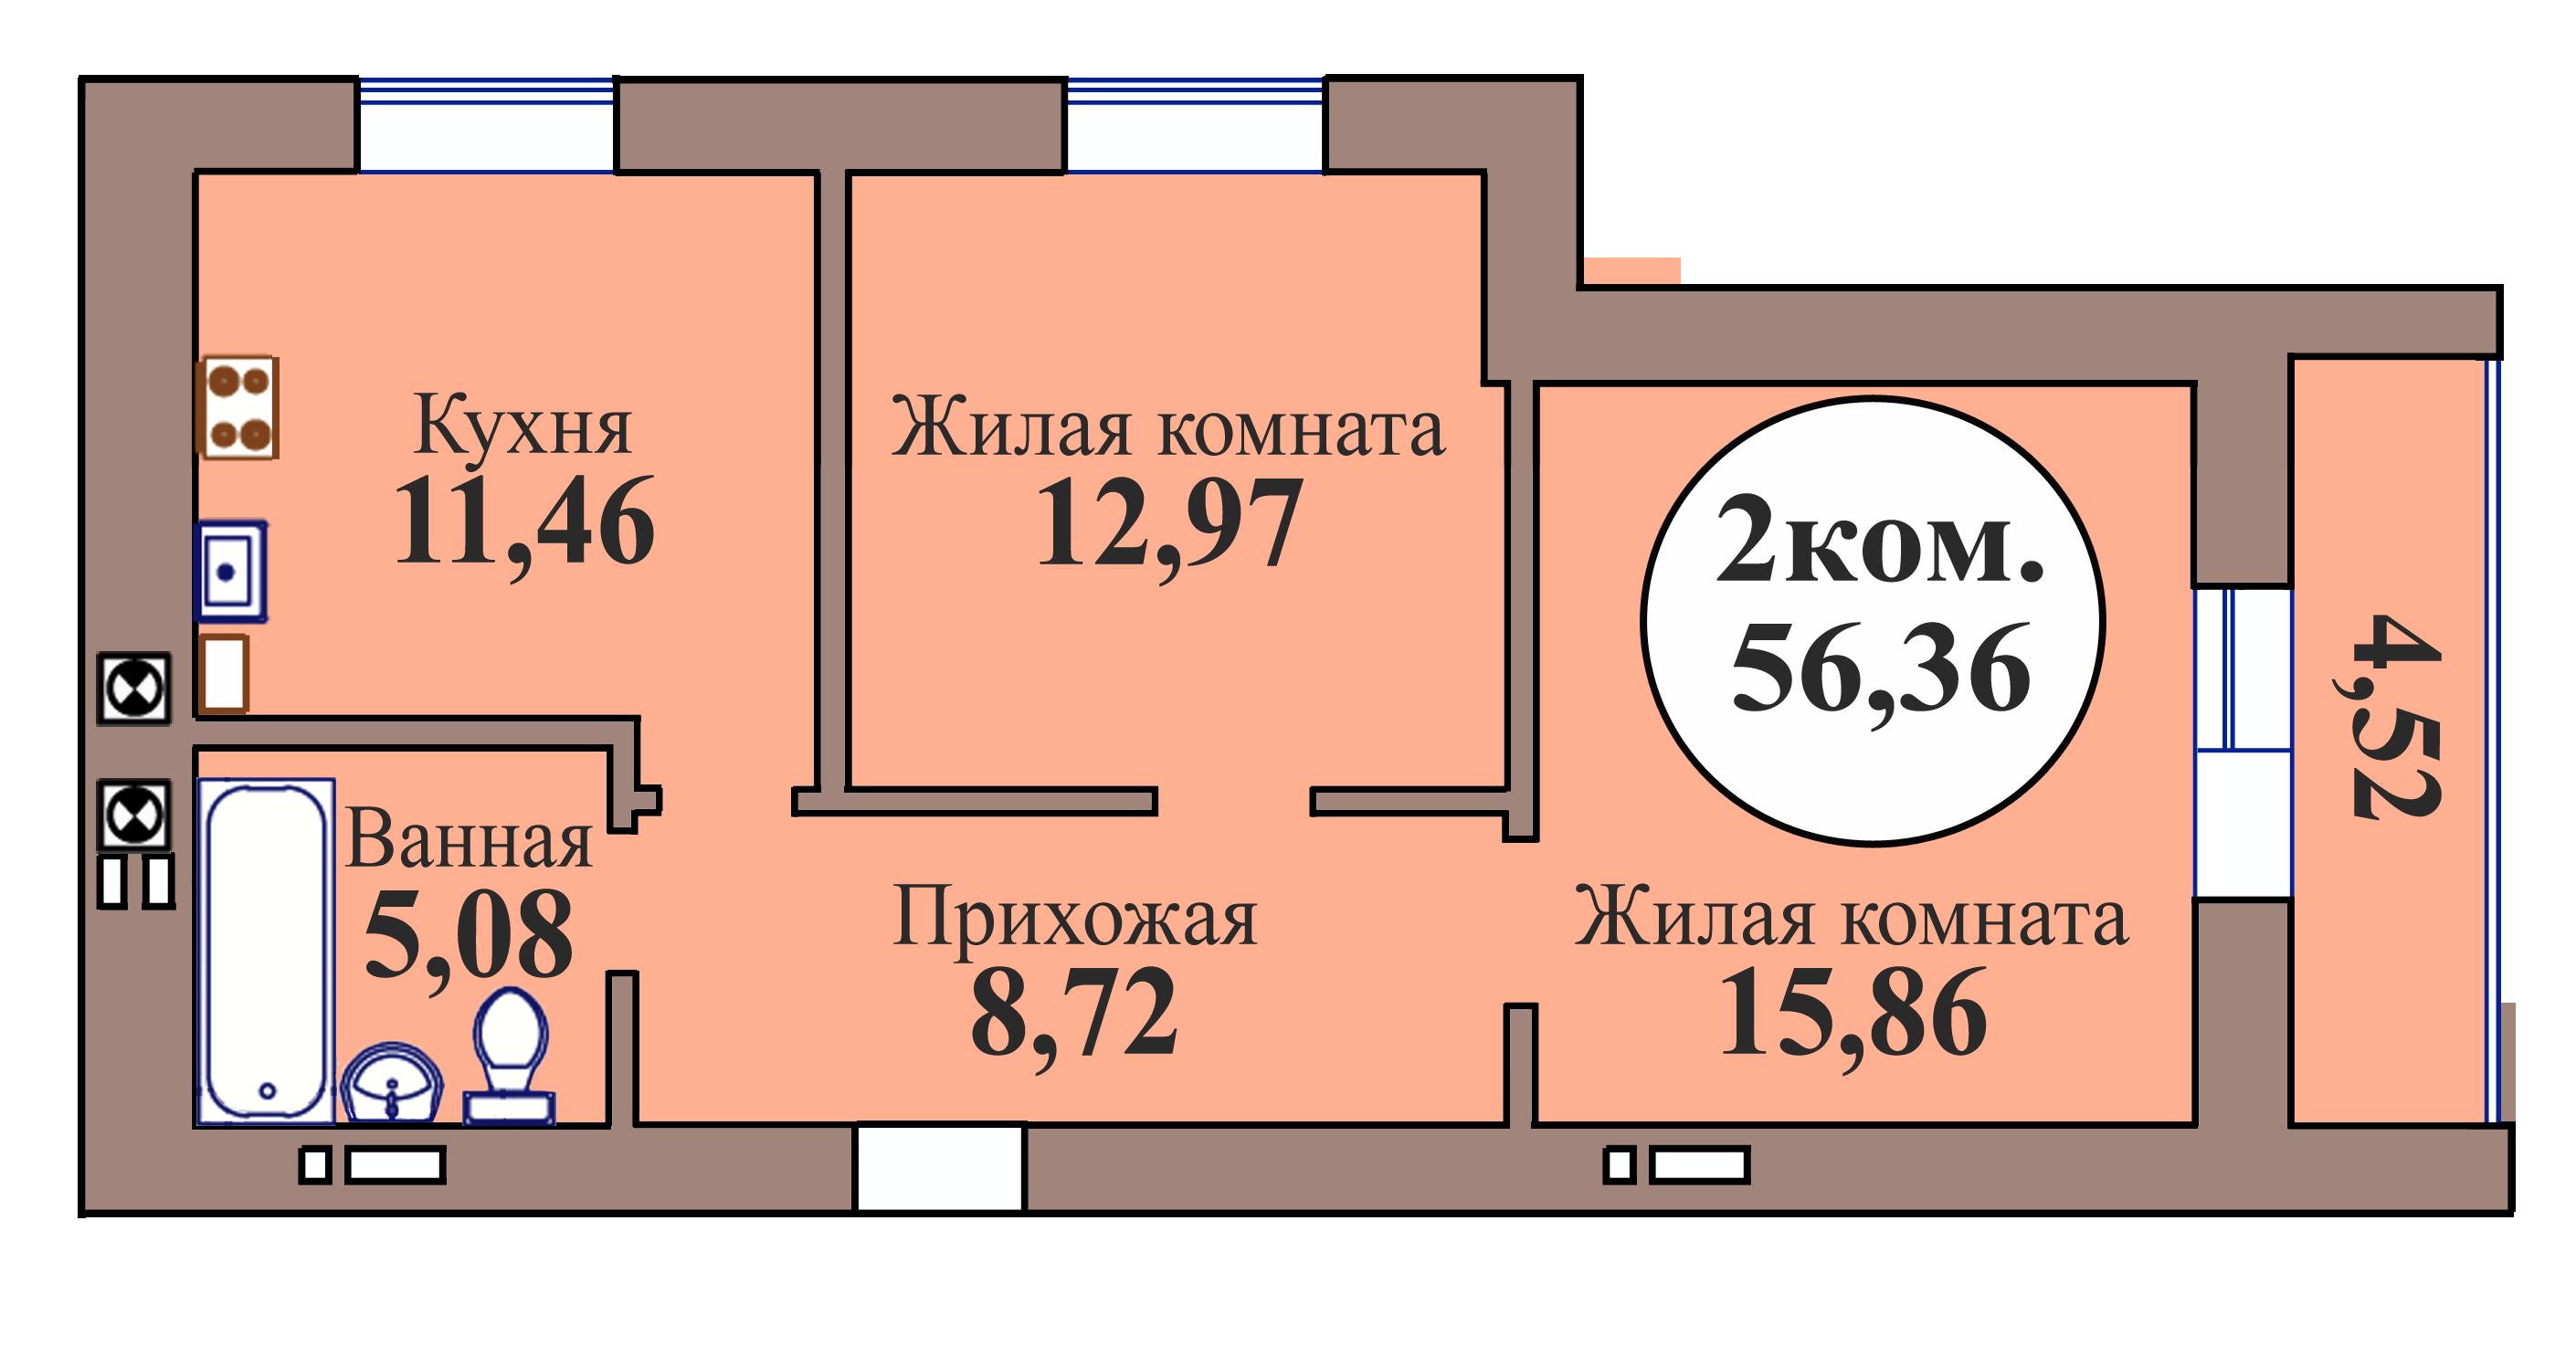 2-комн. кв. по пер. Калининградский, 5 кв. 116 в Калининграде